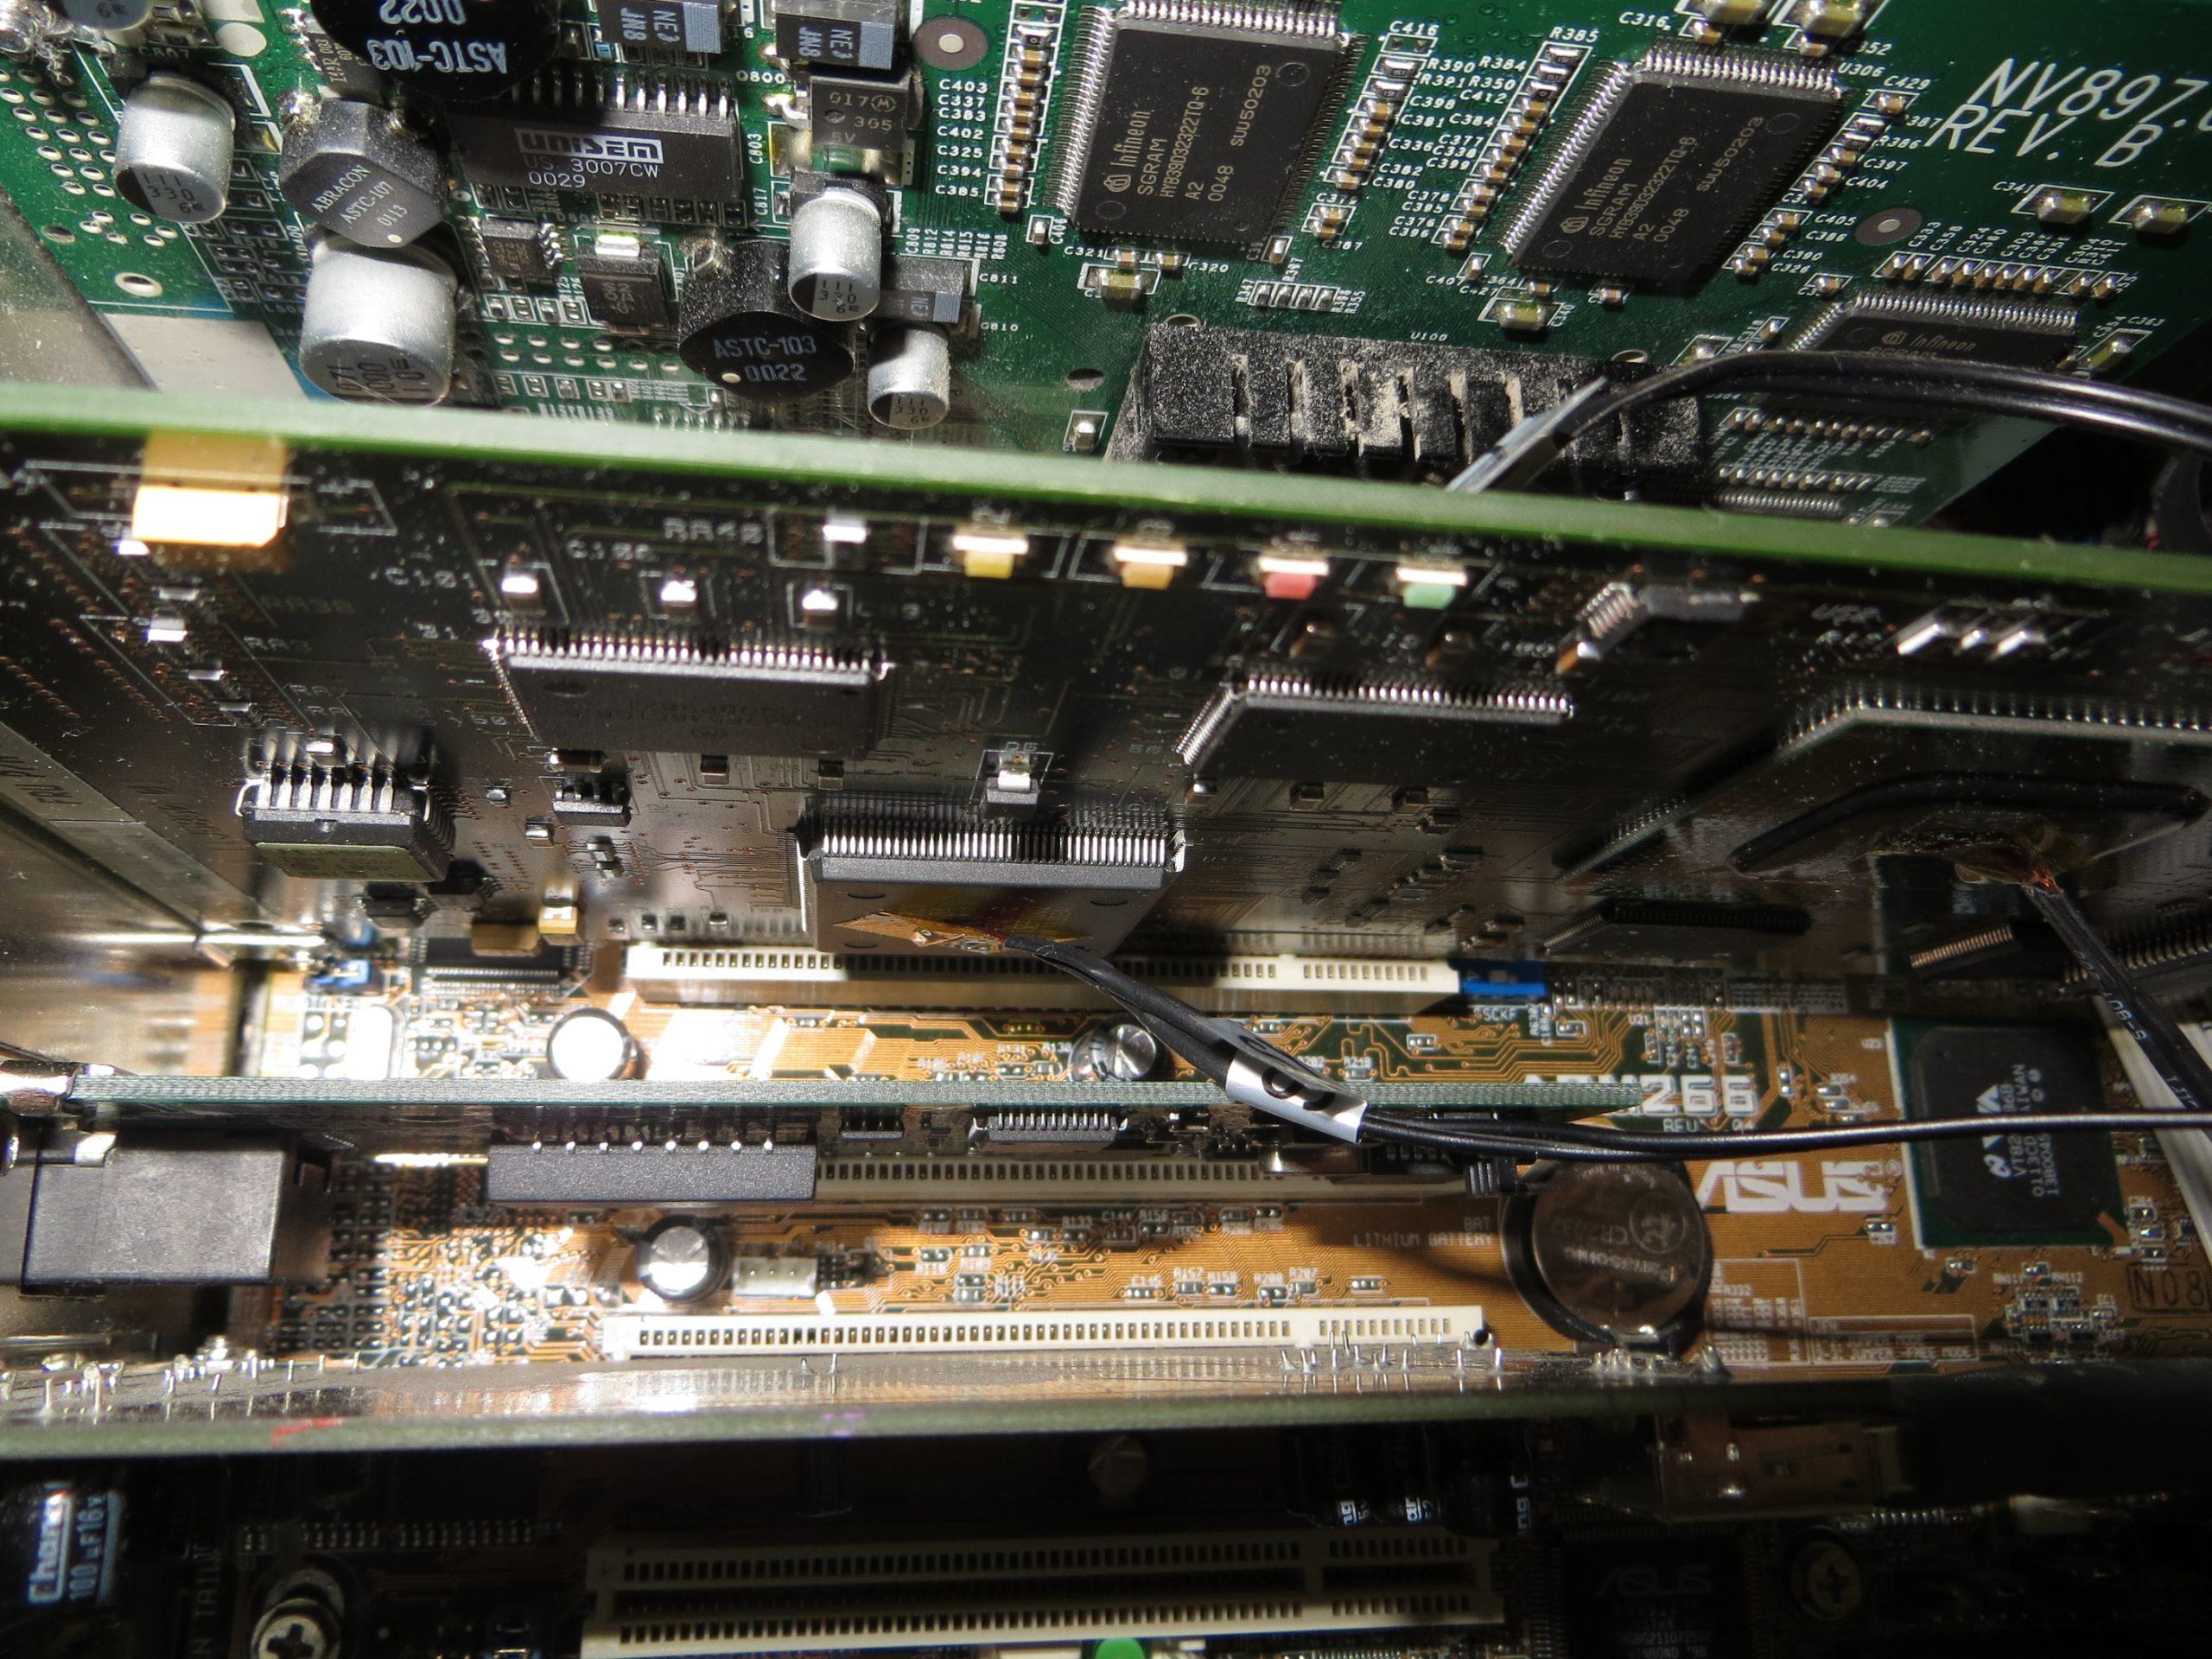 IBM P390/E Processor Card inside 1.33GHz AMD Athlon based PC